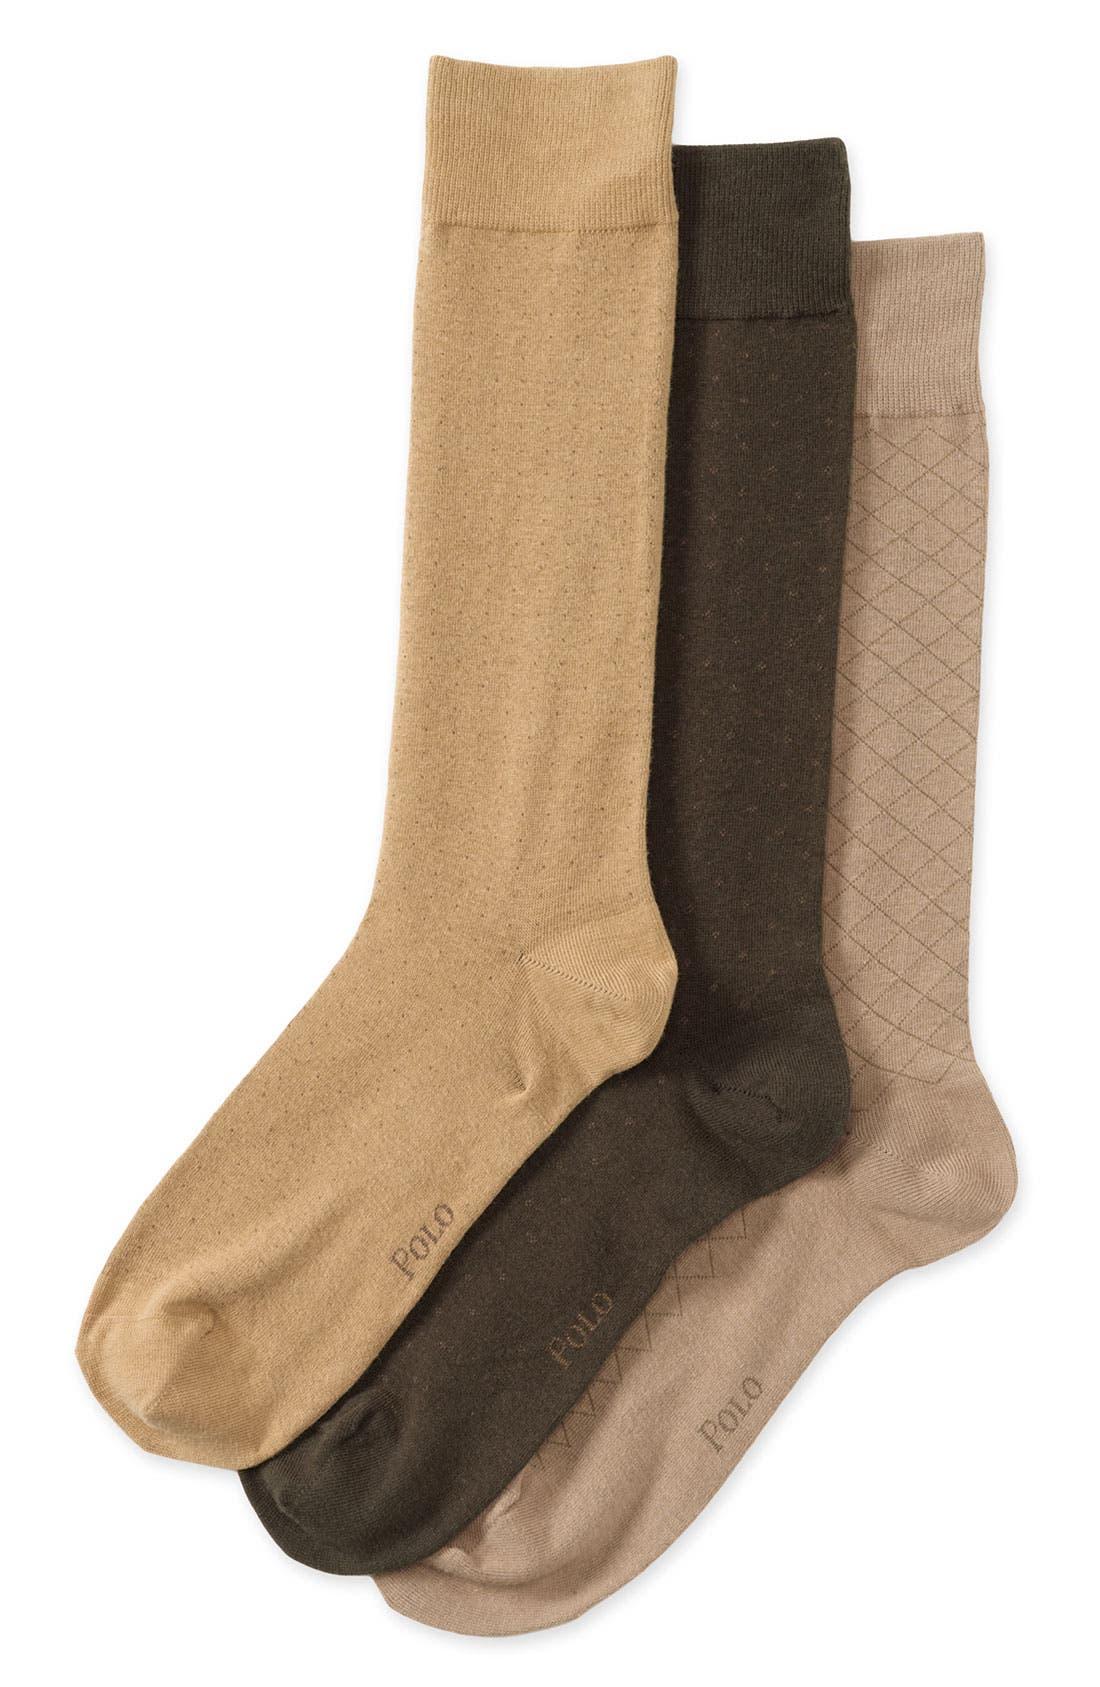 POLO RALPH LAUREN Dress Socks